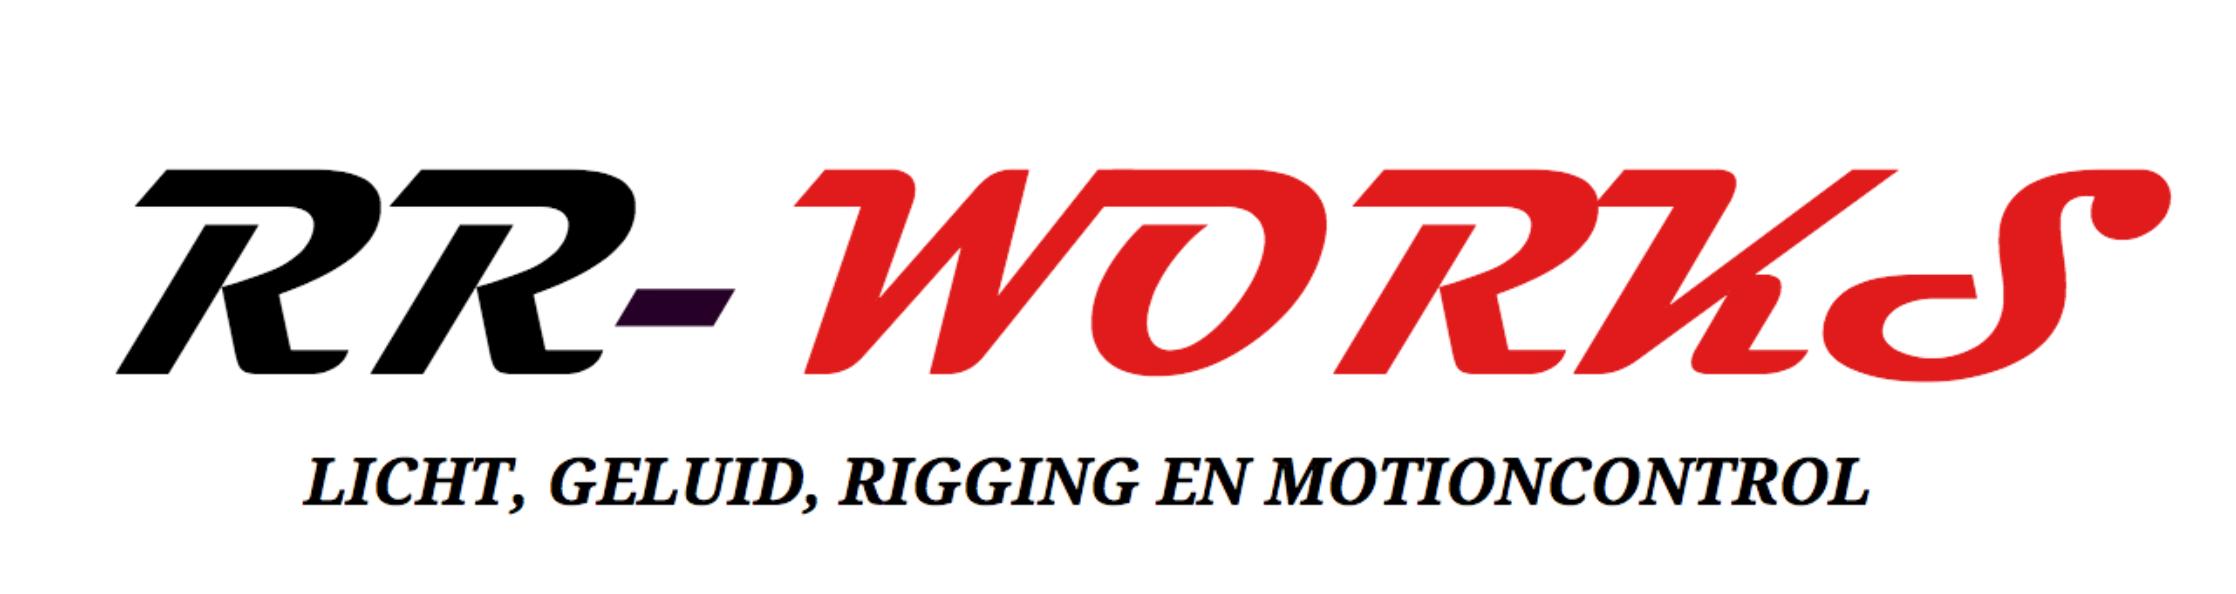 RR-Works